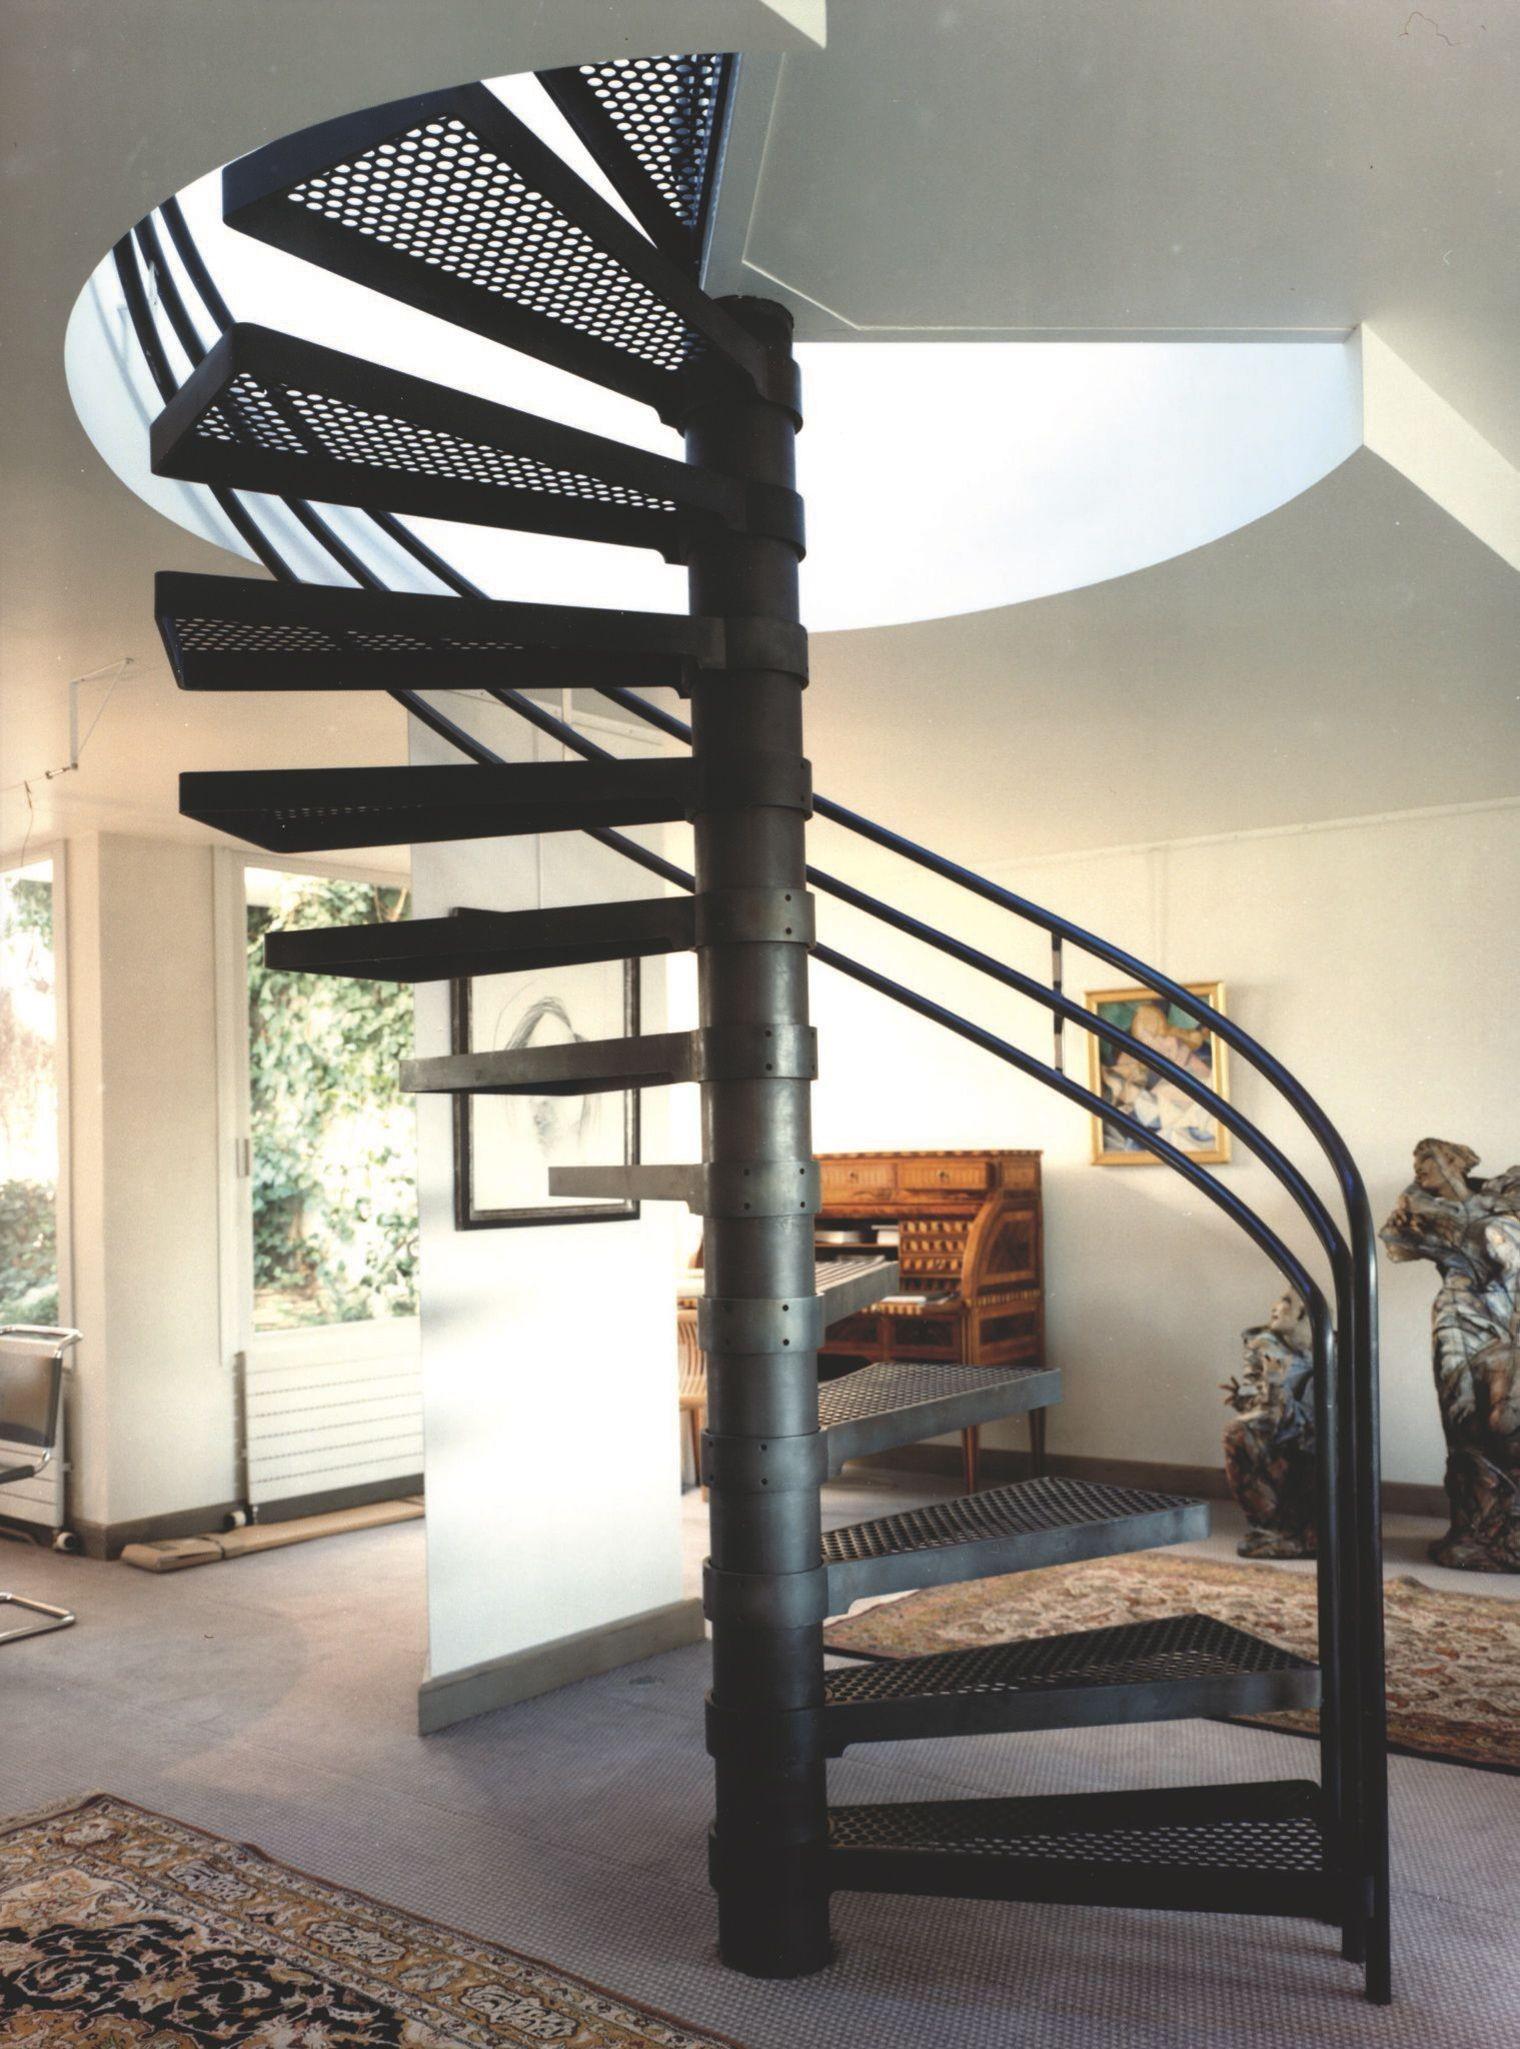 escalier exterieur metal leroy merlin awesome escalier. Black Bedroom Furniture Sets. Home Design Ideas